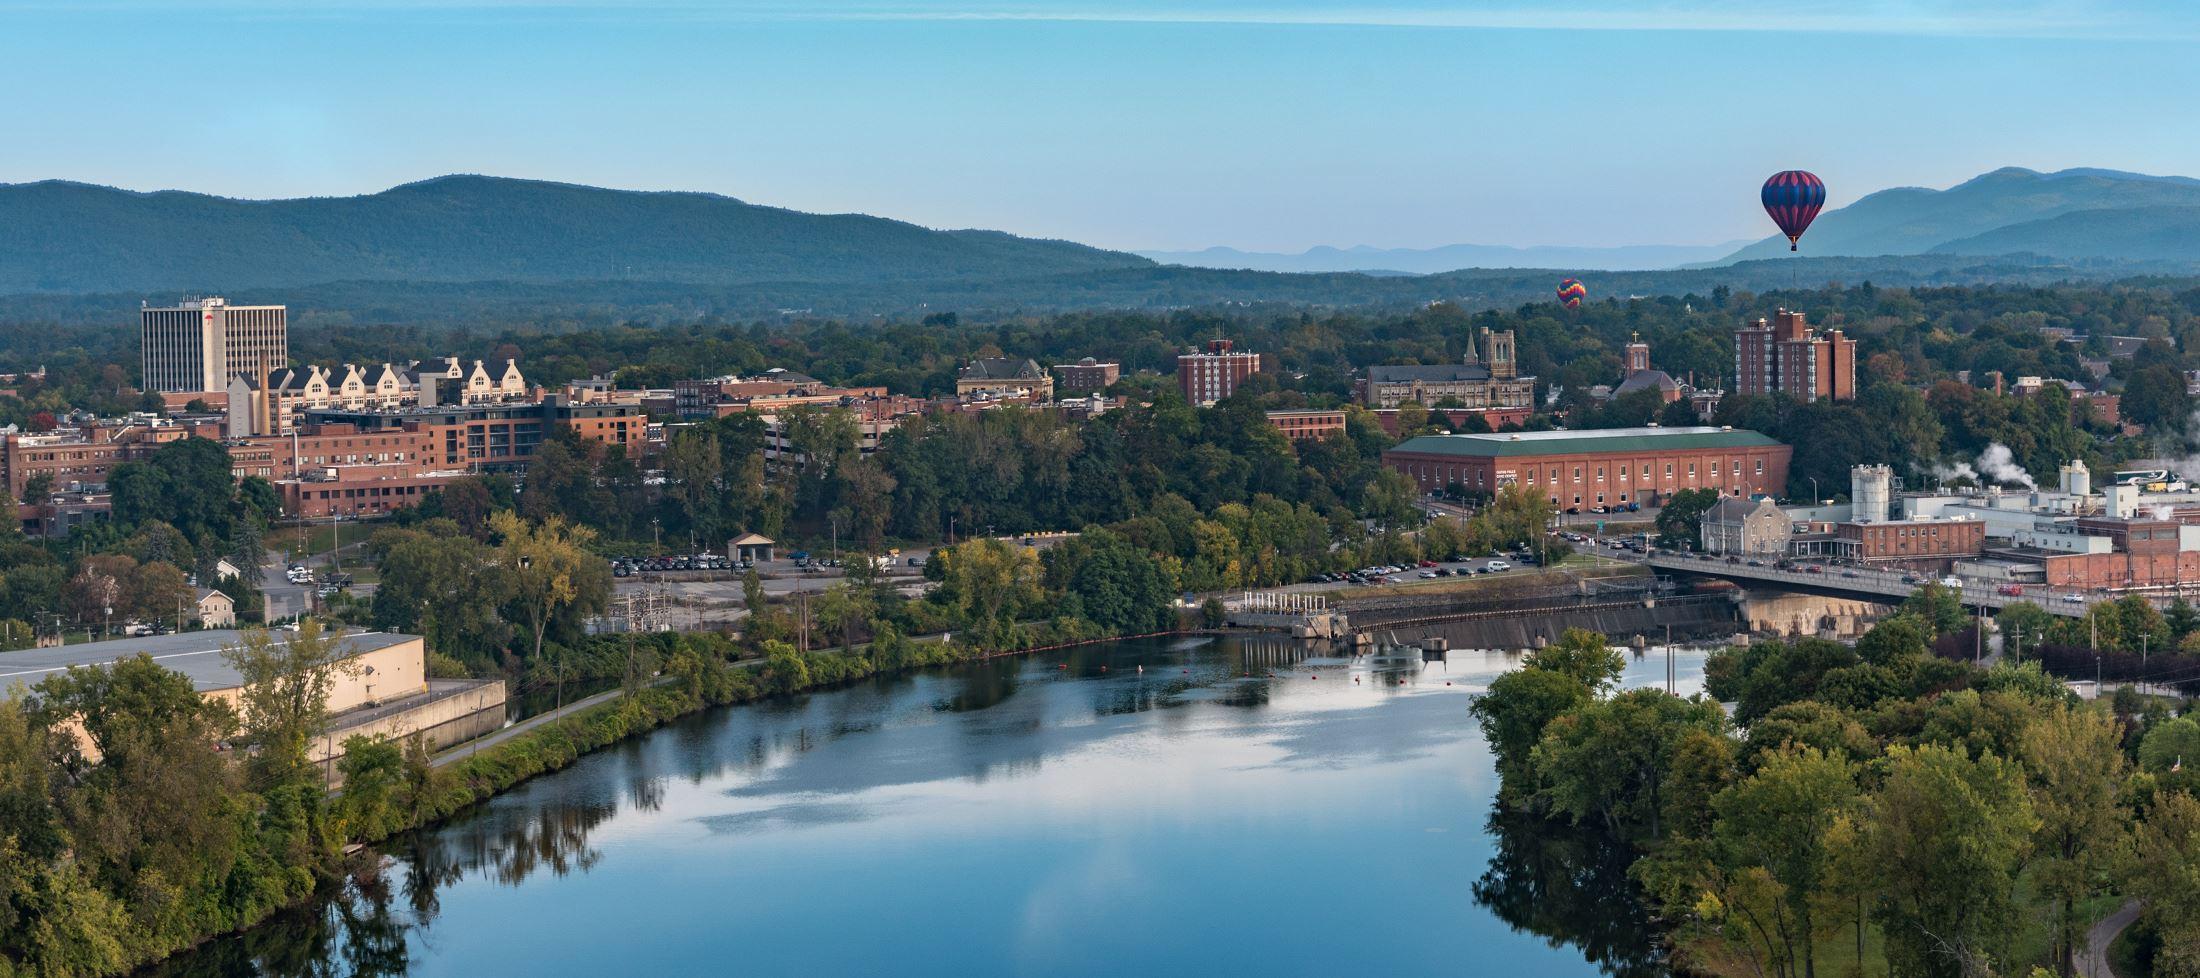 Glens Falls, NY - Official Website | Official Website